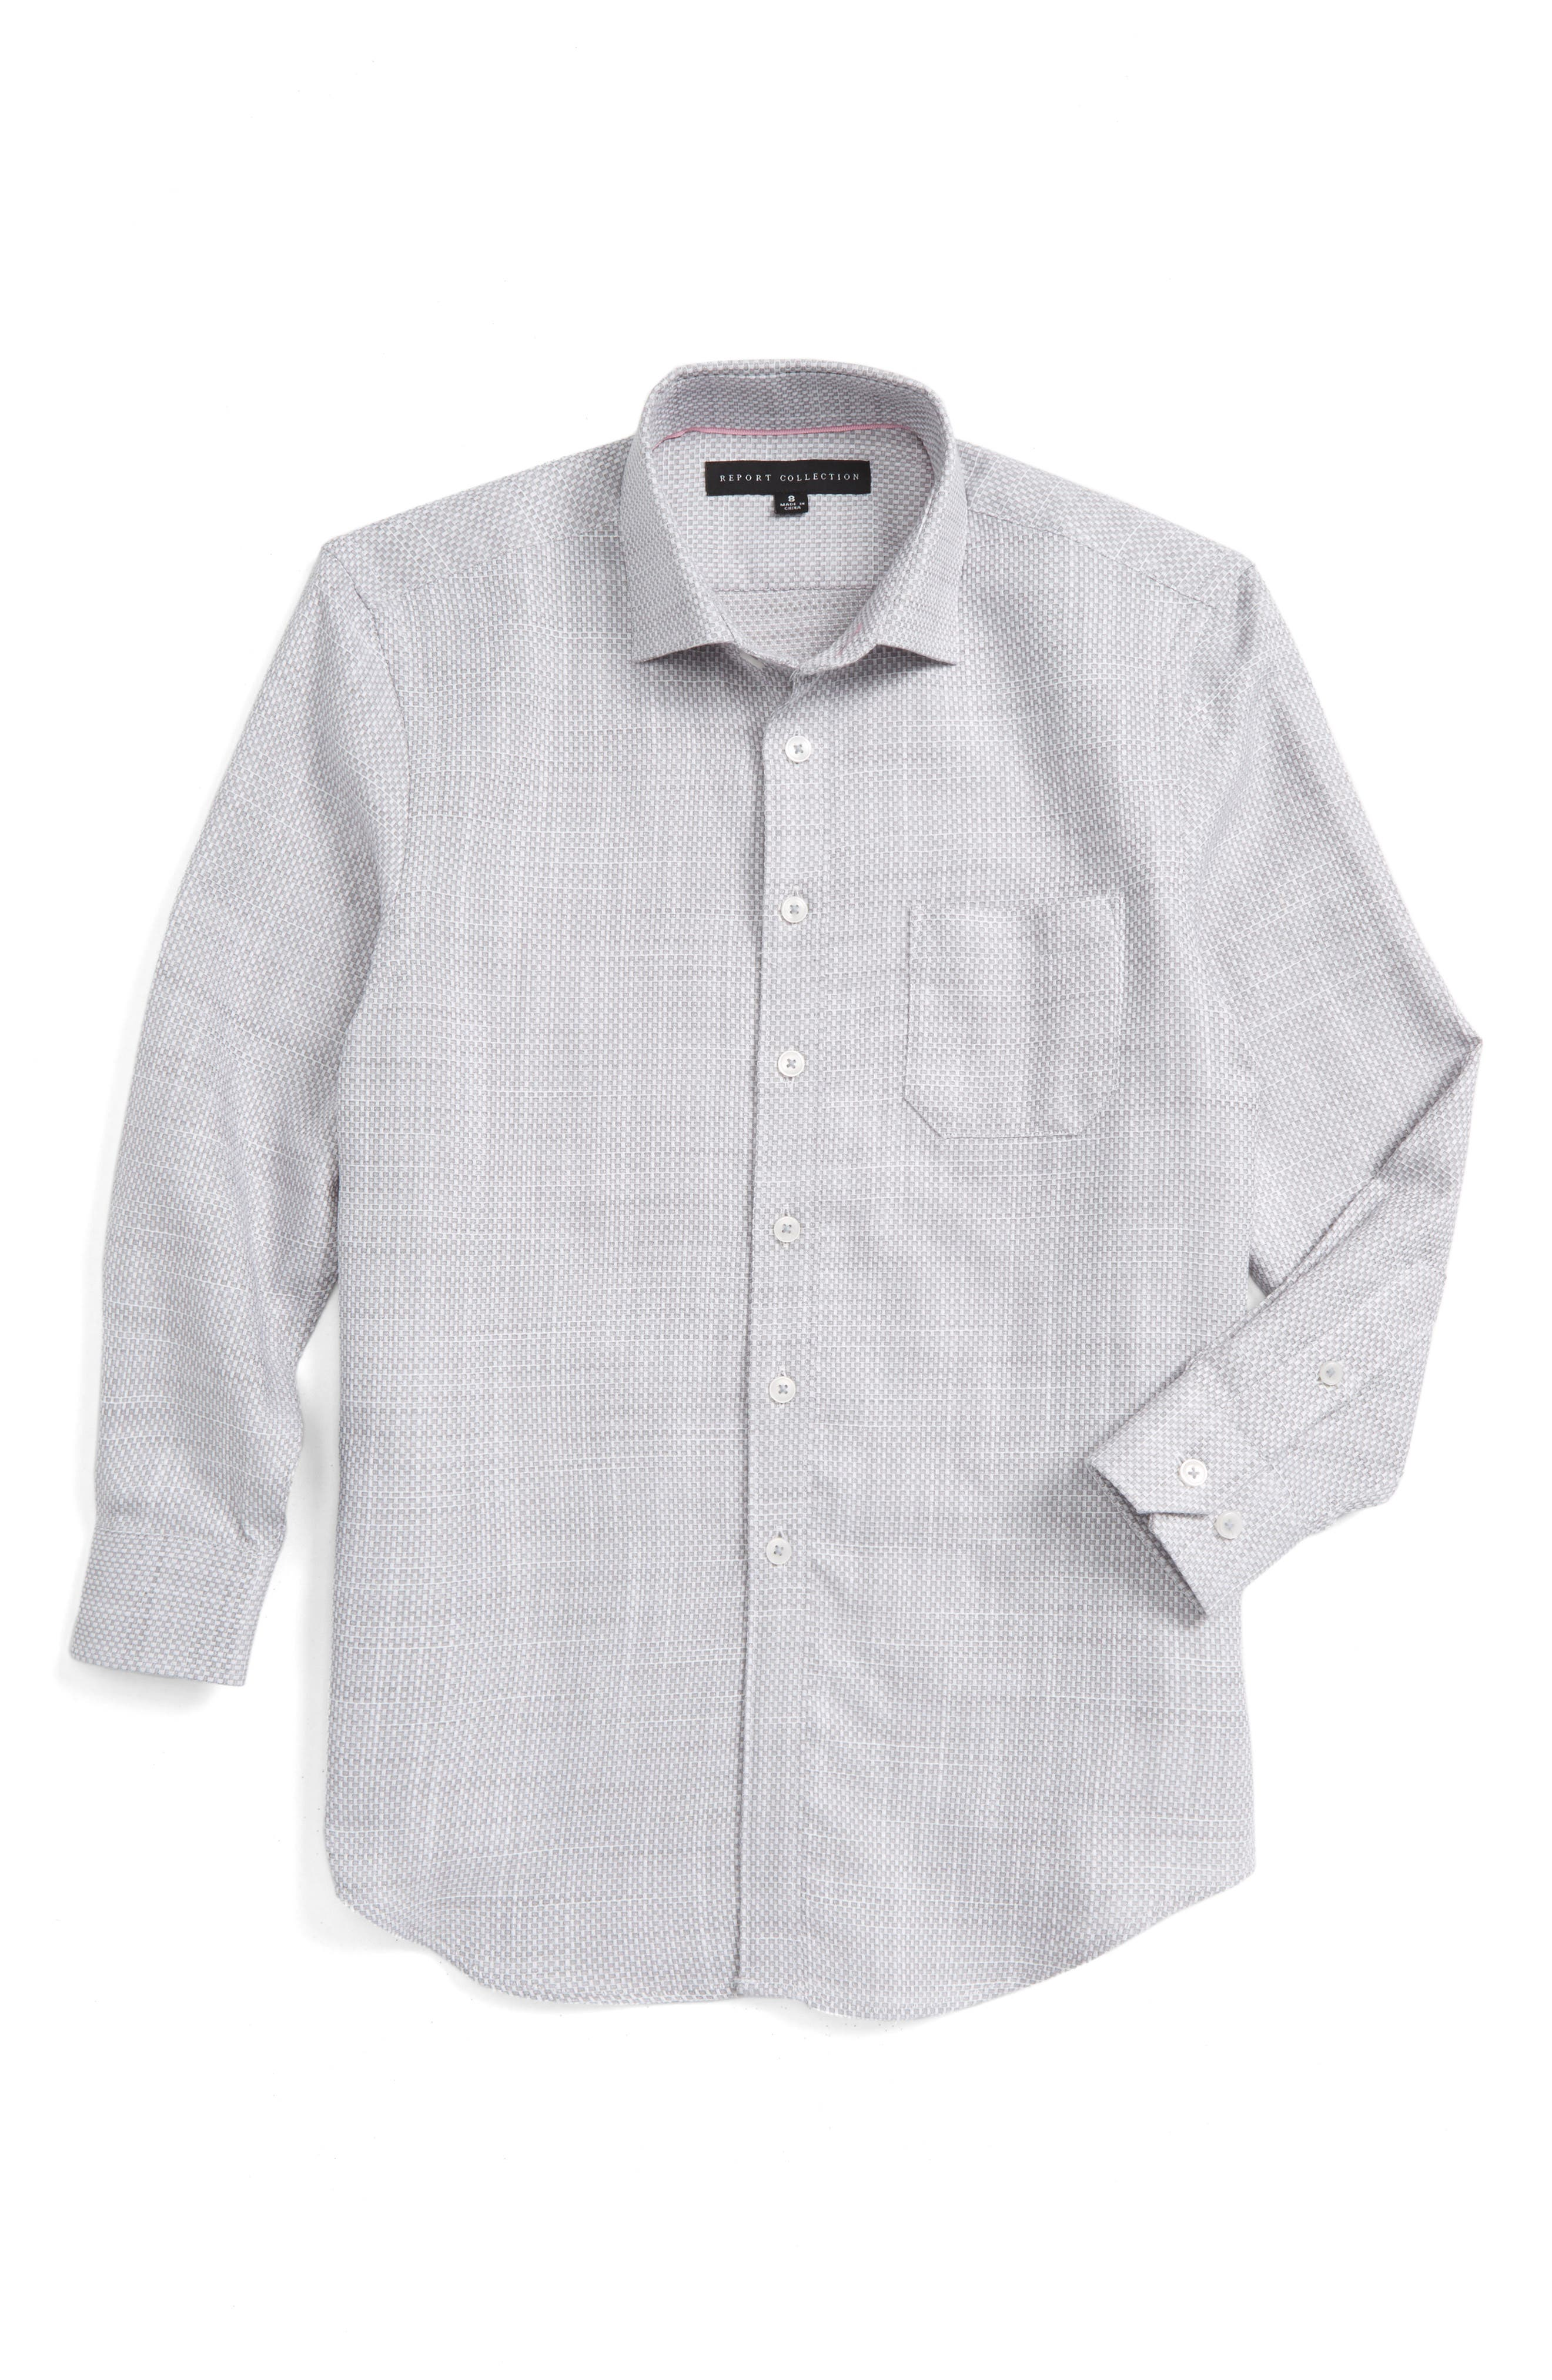 REPORT COLLECTION Woven Dress Shirt